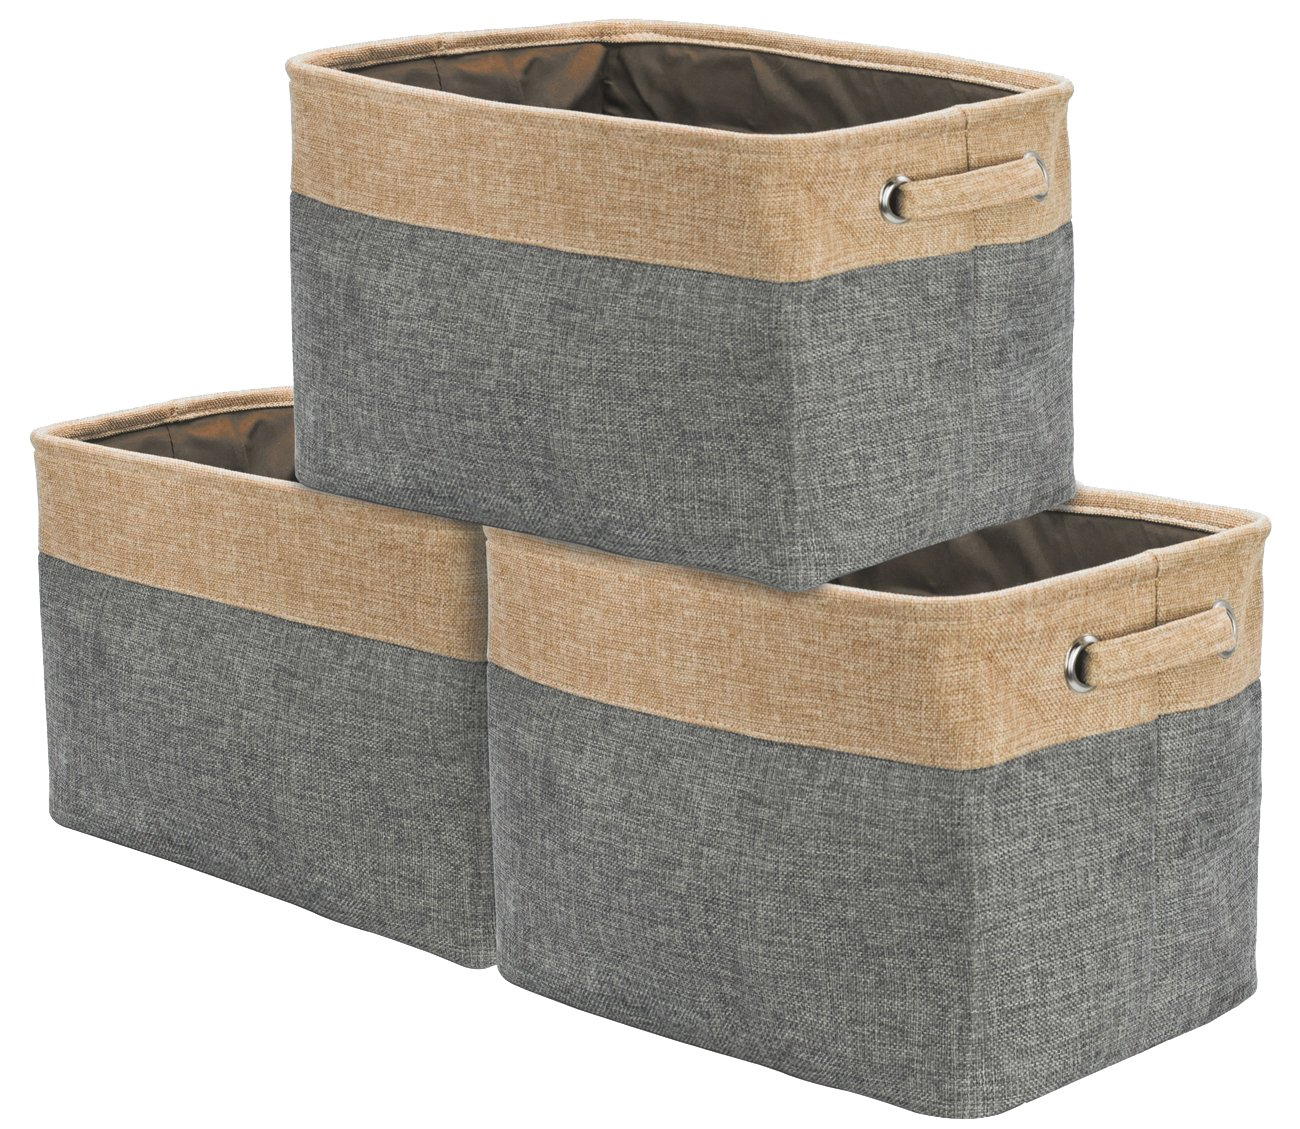 Sorbus Storage Large Basket Set [3-Pack] - 15 L x 10 W x 9 H - Big Rectangular Fabric Collapsible Organizer Bin Carry Handles Linens, Towels, Toys, Clothes, Kids Room, Nursery (Grey/Tan)